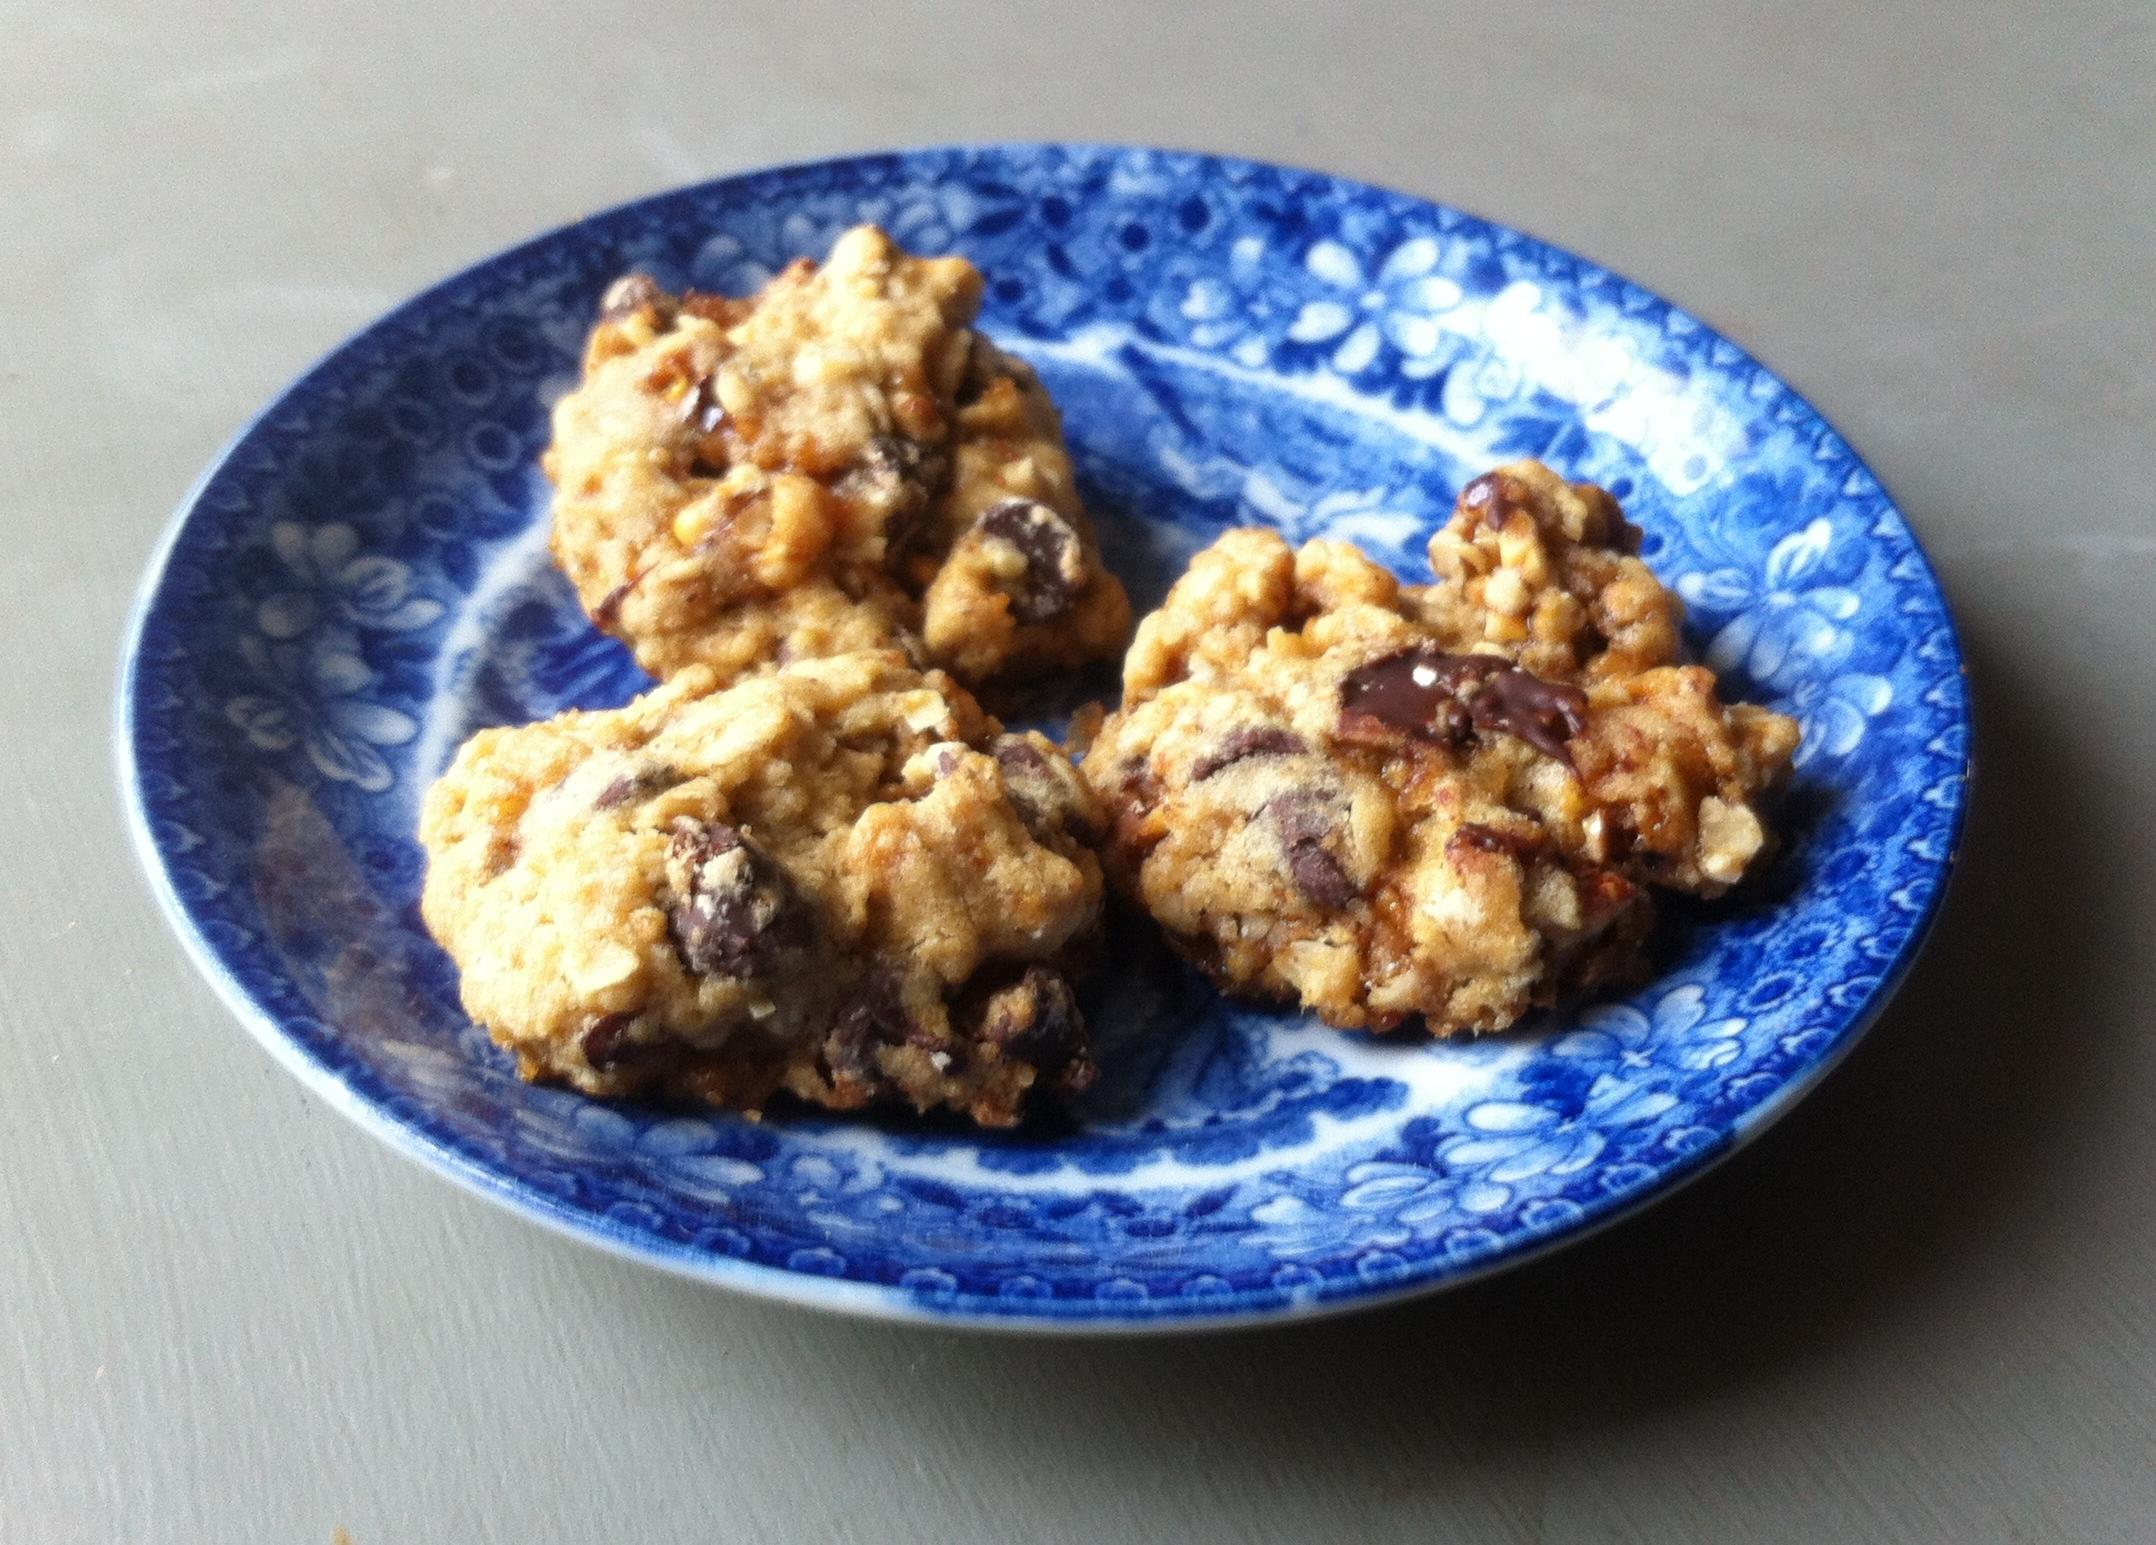 Oatmeal chocolate chip pecan praline cookies